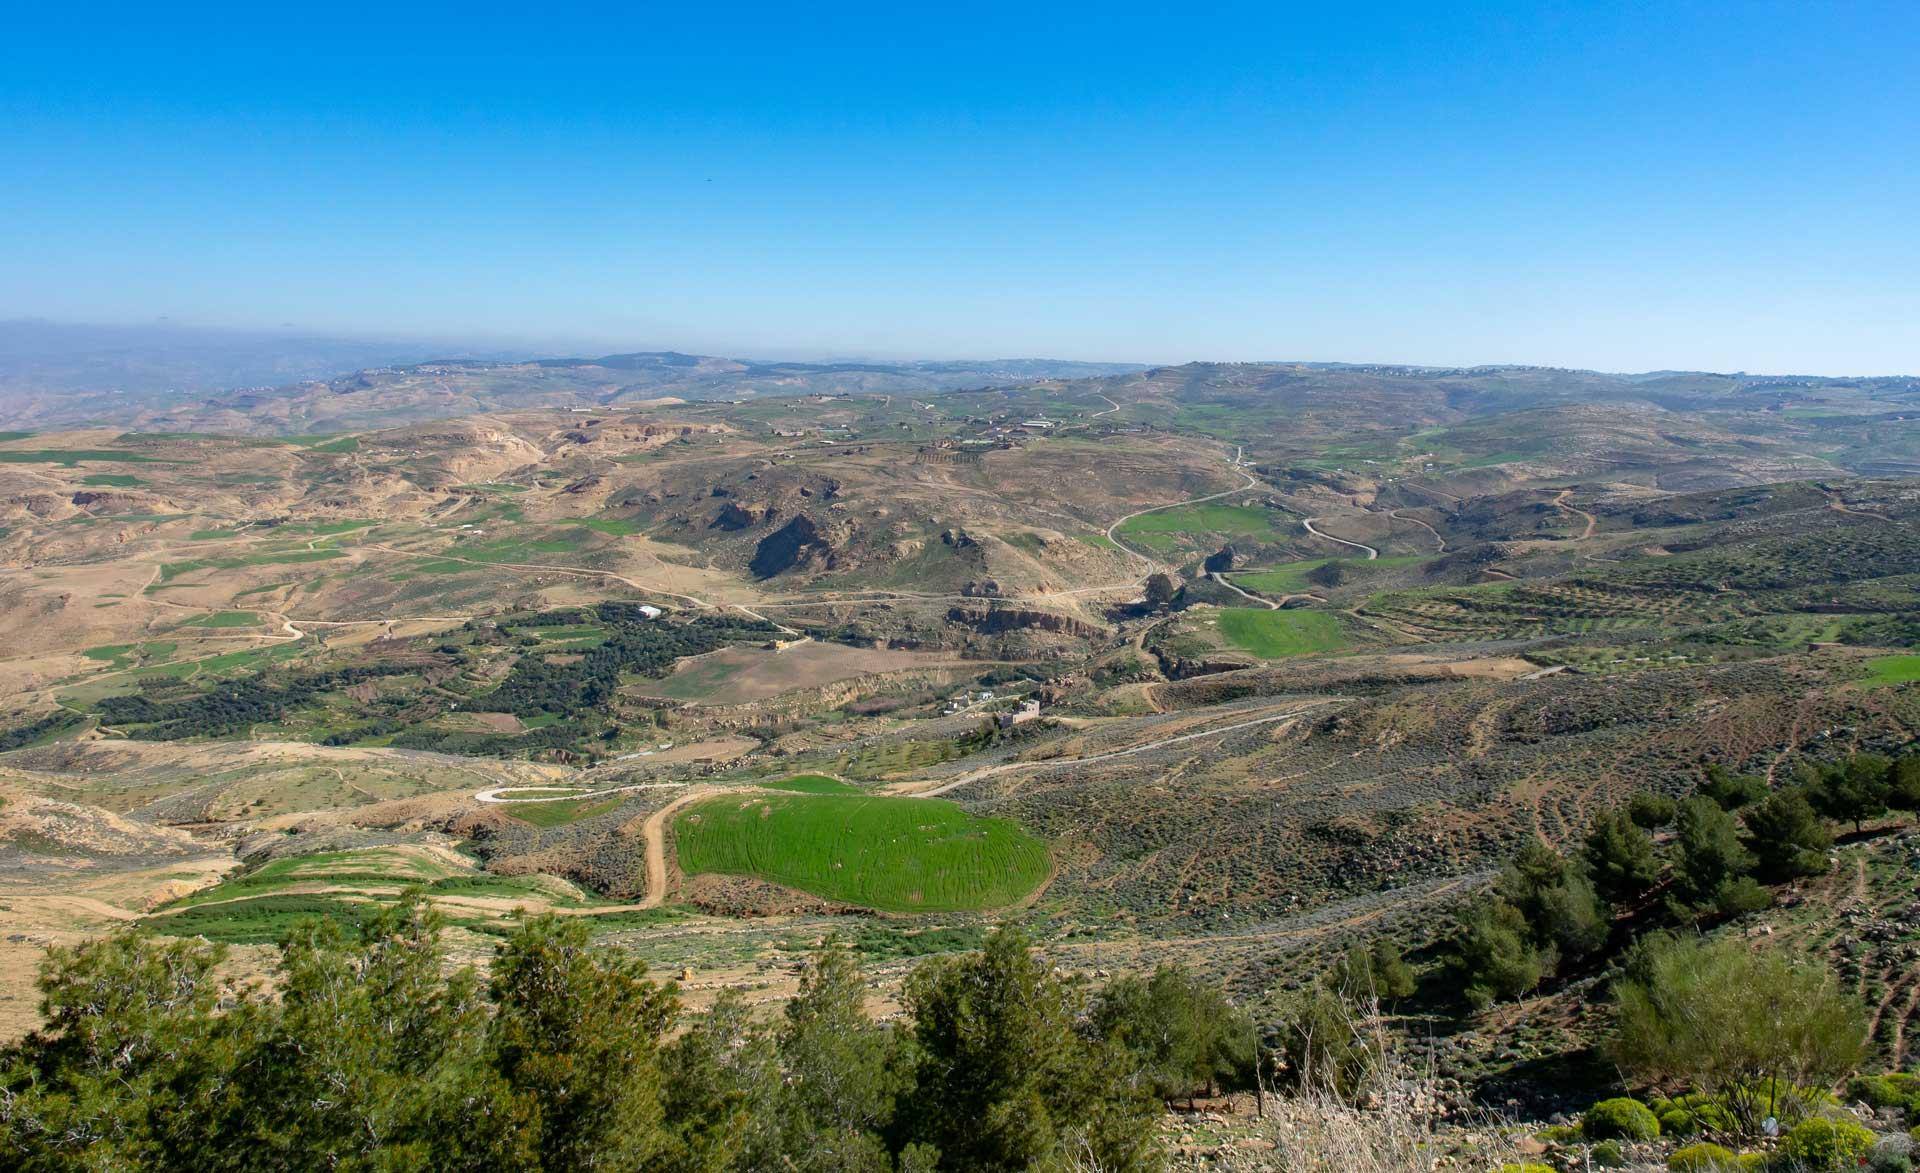 Ausblick ins Jordantal vom Berg Nebo